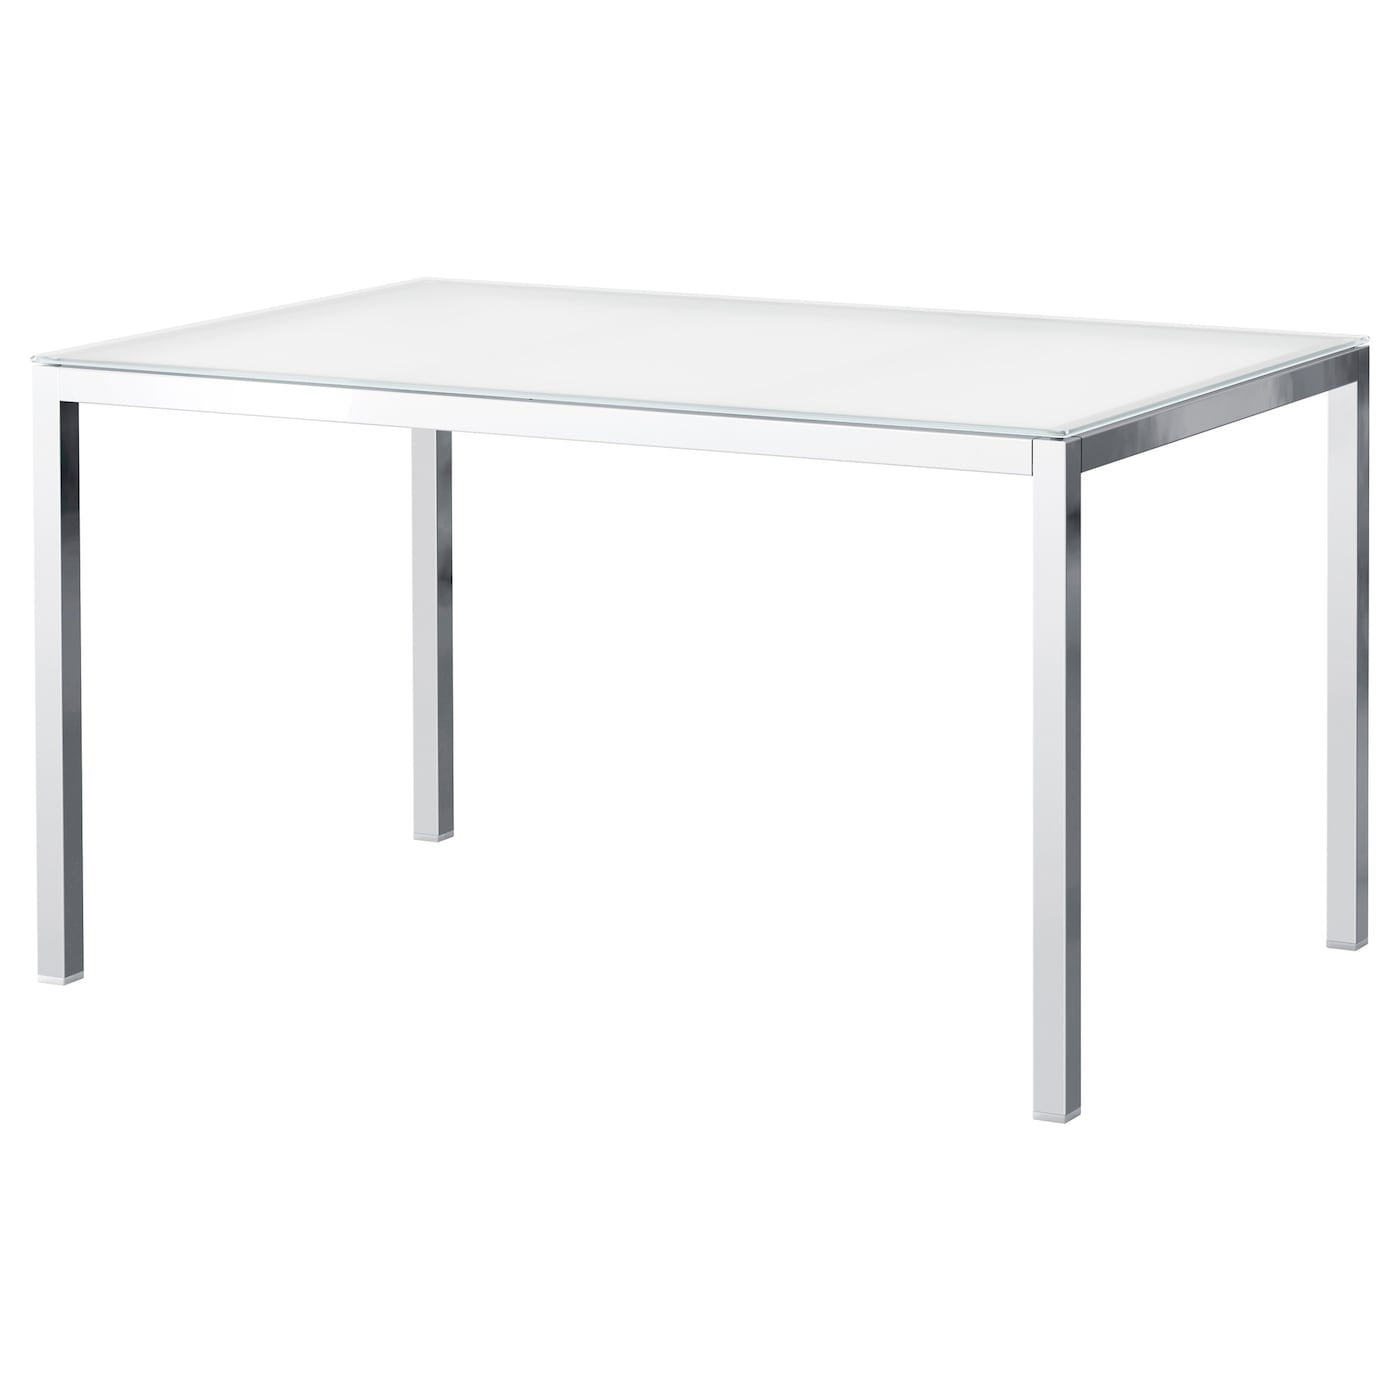 Torsby Table Chrome Platedglass White 135 X 85 Cm Ikea